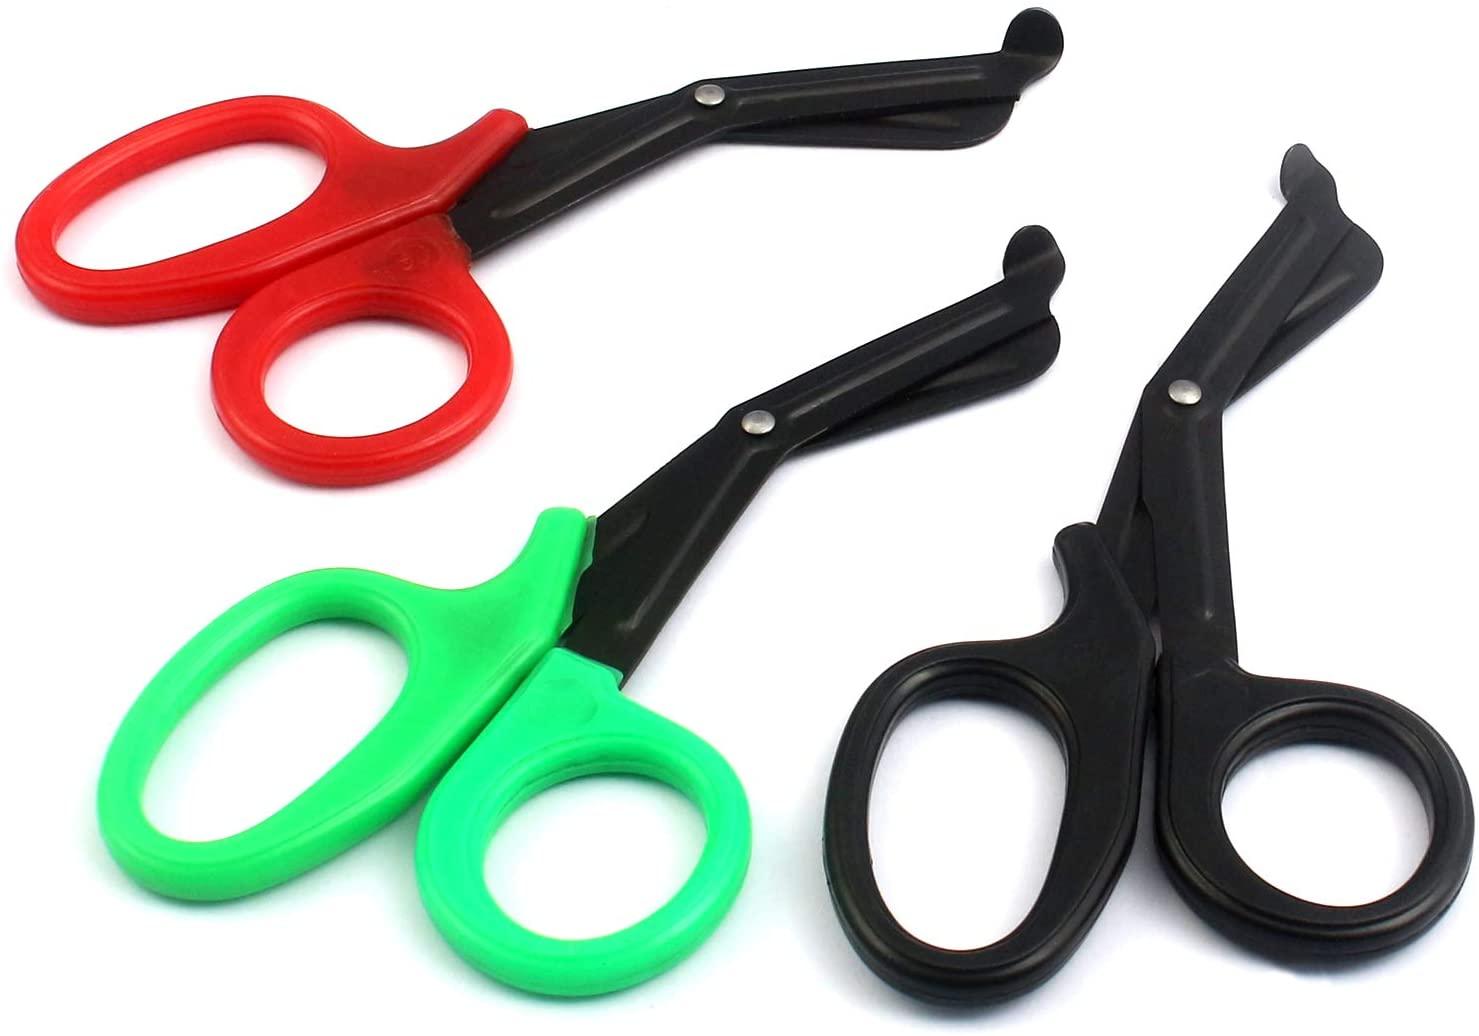 OdontoMed2011® 3 Pieces Fluoride Coated Blade Utility Scissors 7.25 EMT Paramedic Nurse Scissor Bandage Doctor First Aid (Black + Green + Red) 7 1/4 EMT Utility Shears Scissors